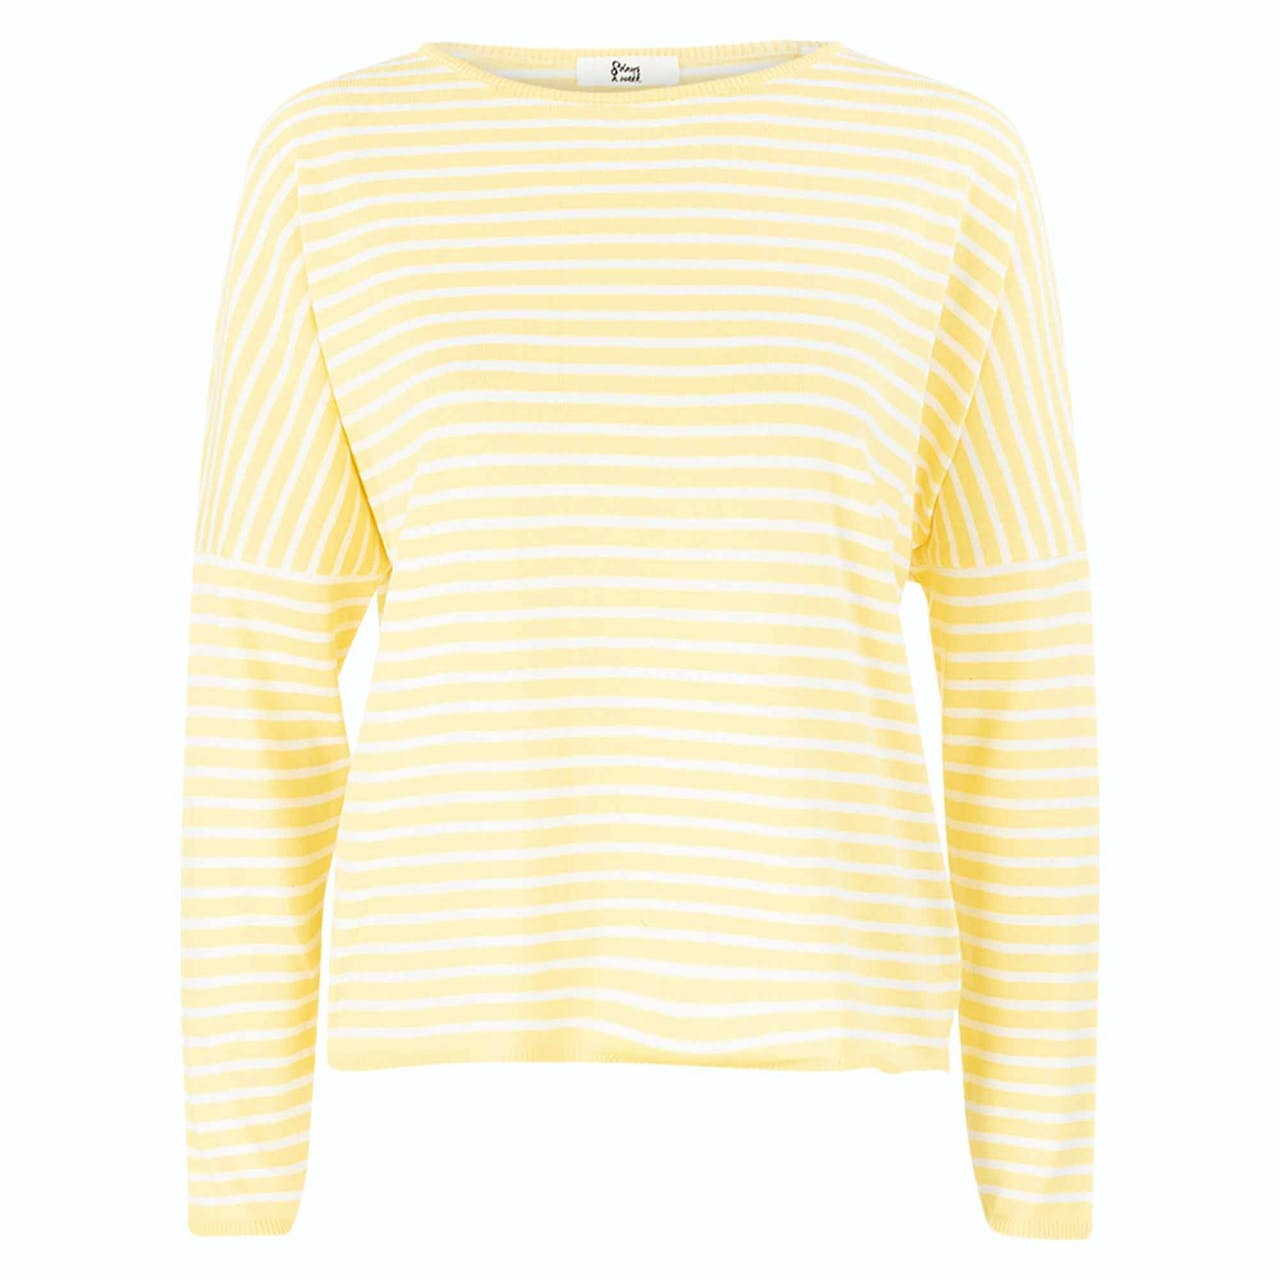 Sweatshirt - Loose Fit -Stripes